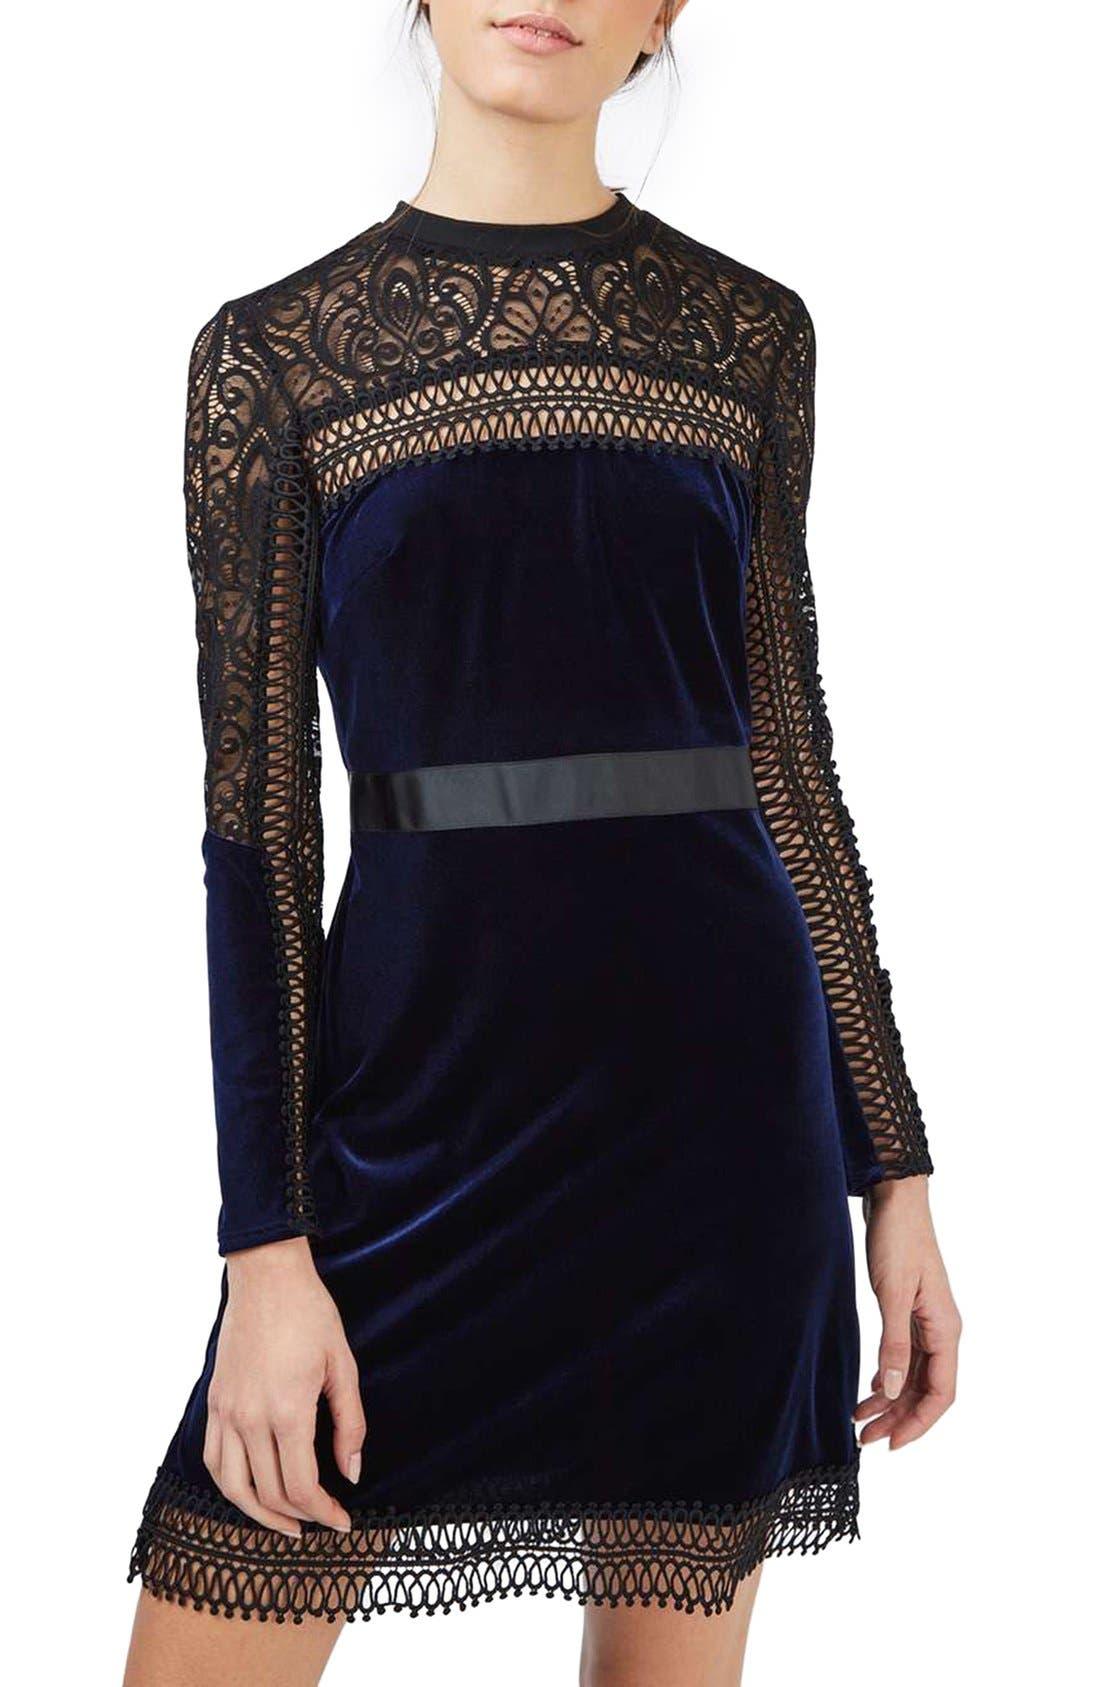 Alternate Image 1 Selected - Topshop Lace & Velvet Dress